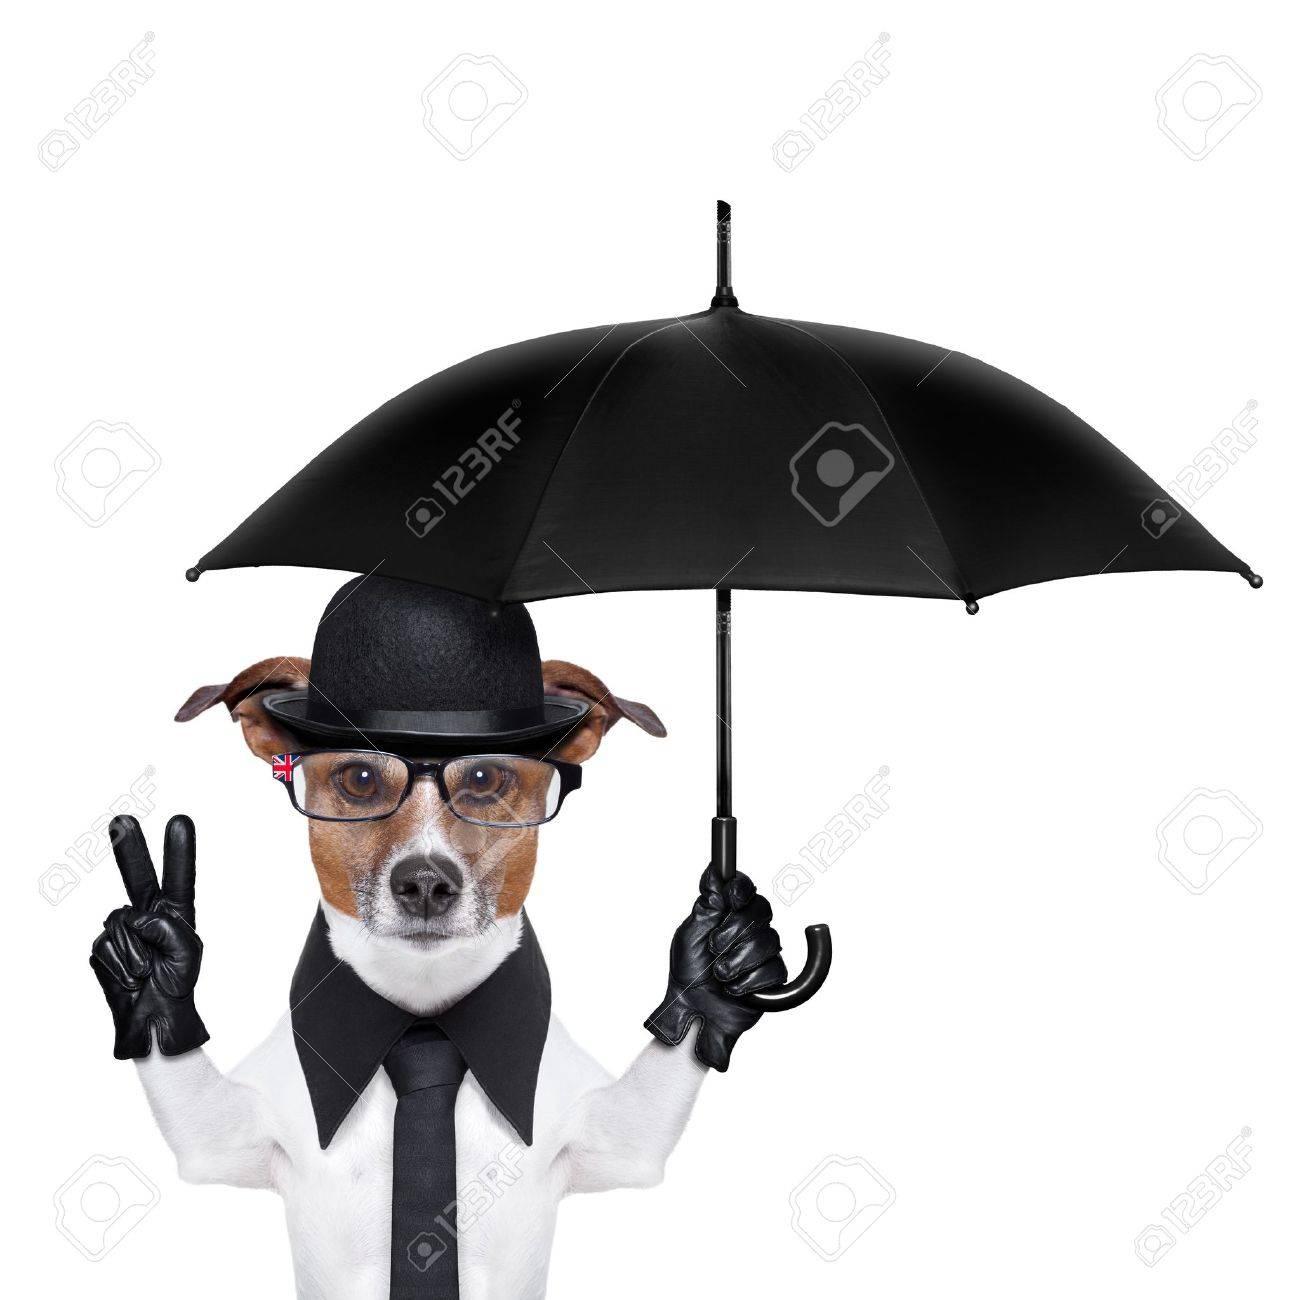 british dog with black bowler hat and black suit holding am umbrella Stock Photo - 19632475